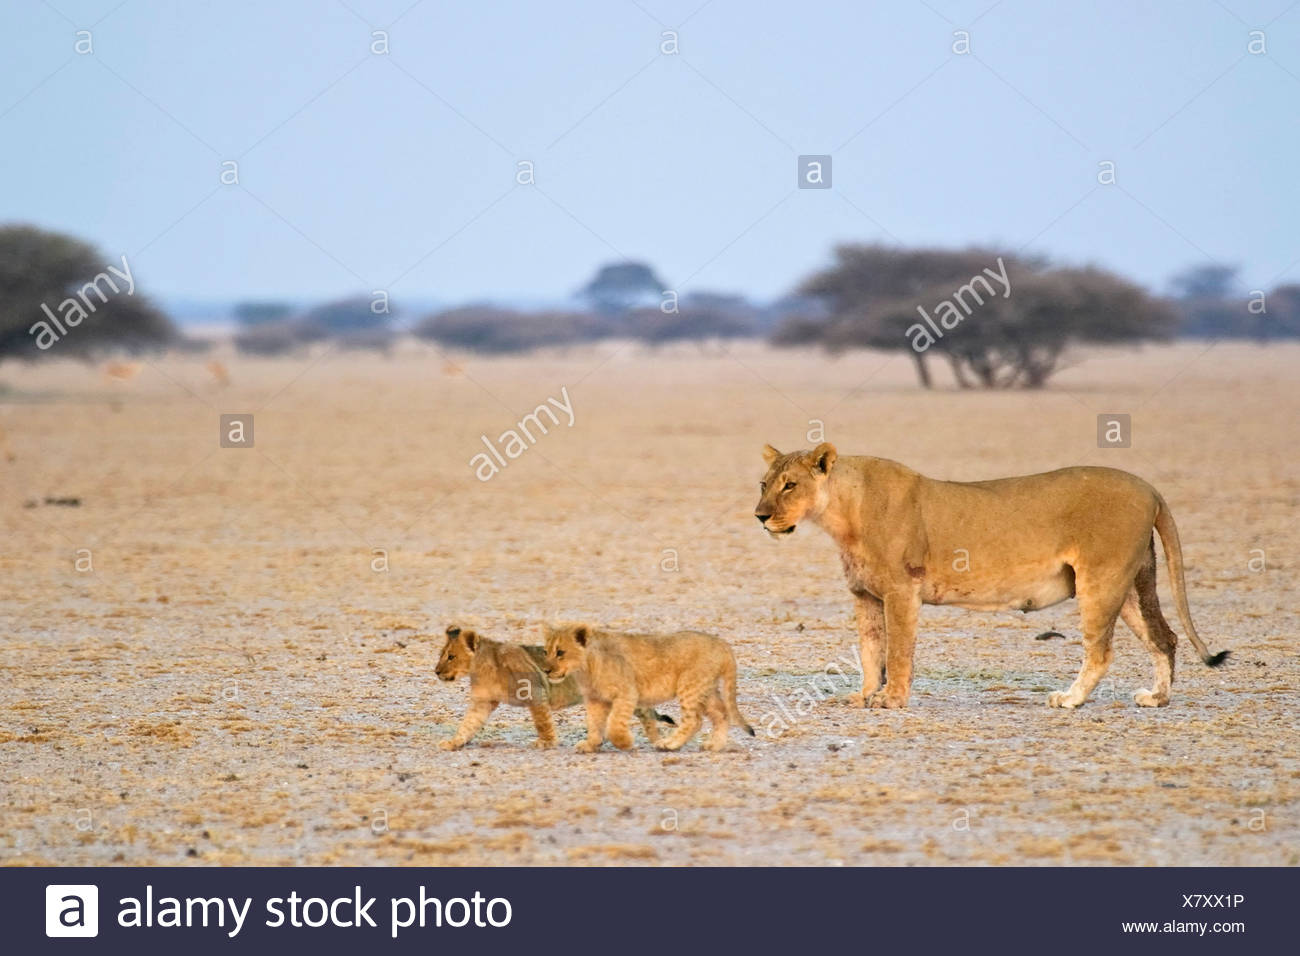 Lioness (Panthera leo) is walking with her cups, Nxai Pan, Makgadikgadi Pans National Park, Botswana, Africa Stock Photo